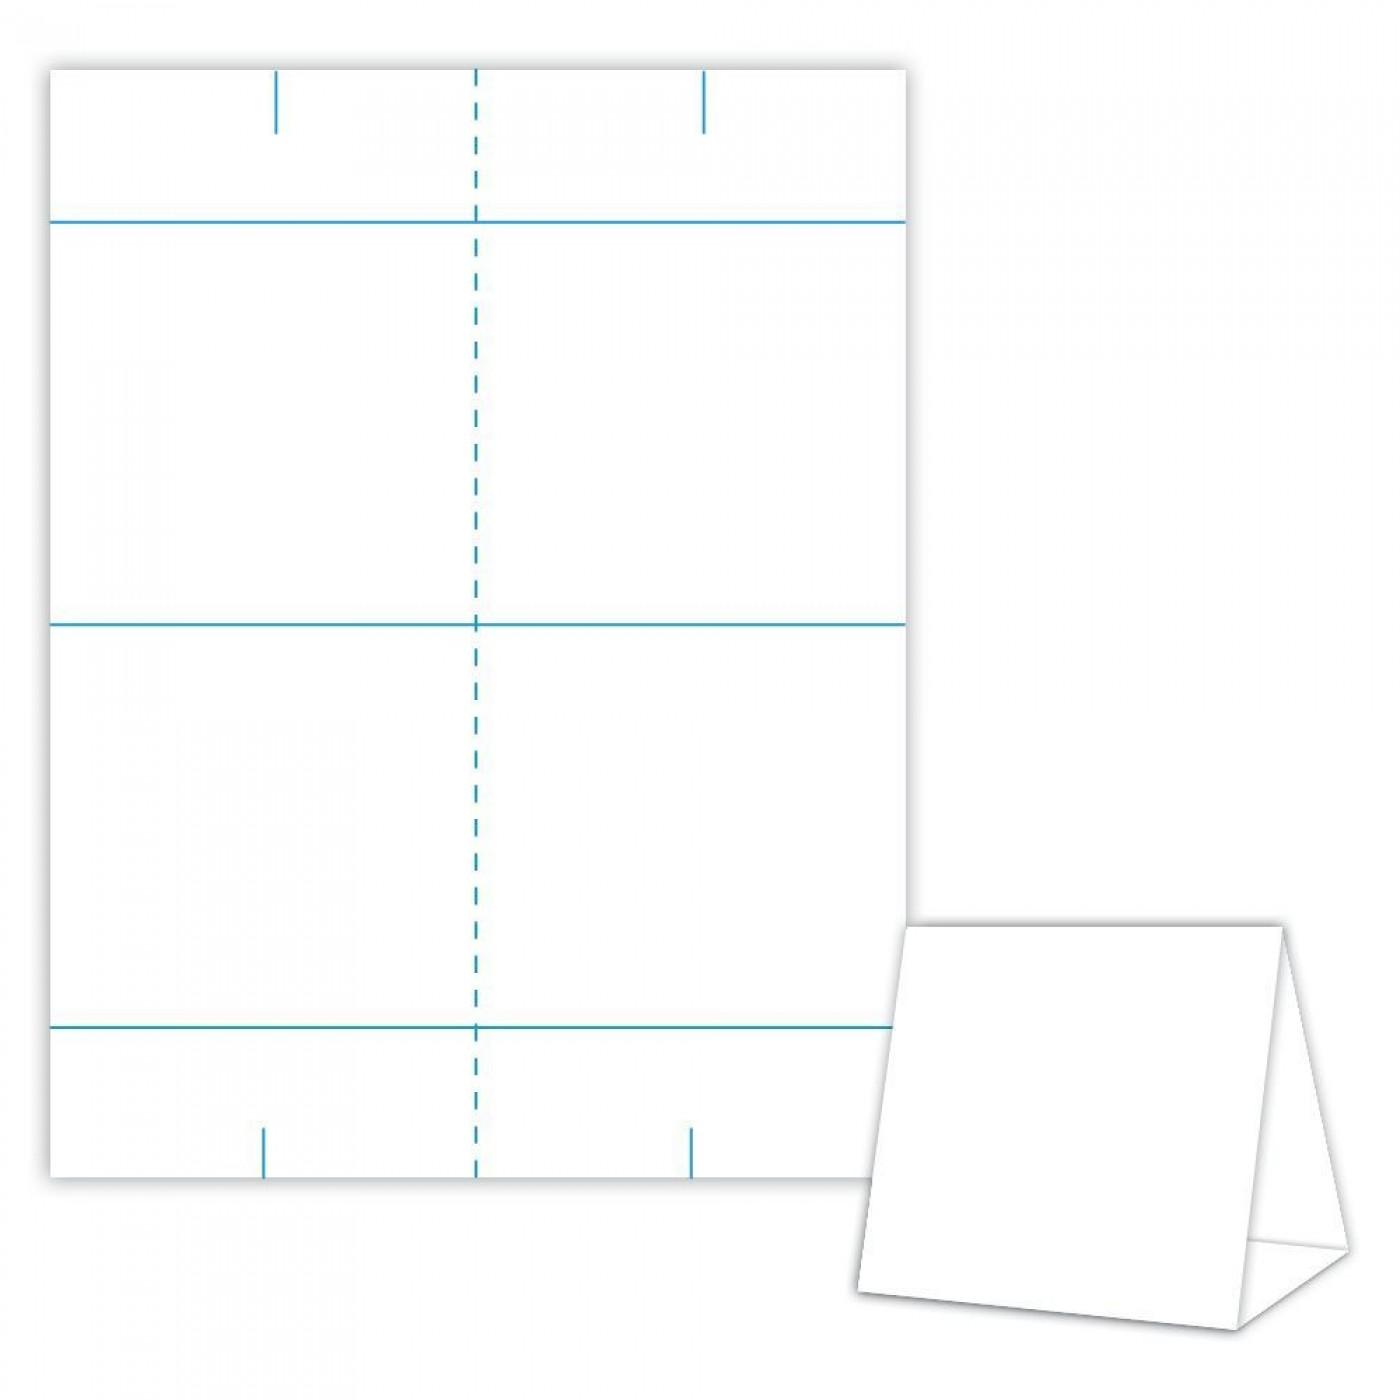 001 Impressive Tri Fold Table Tent Template Idea  Free Word1400